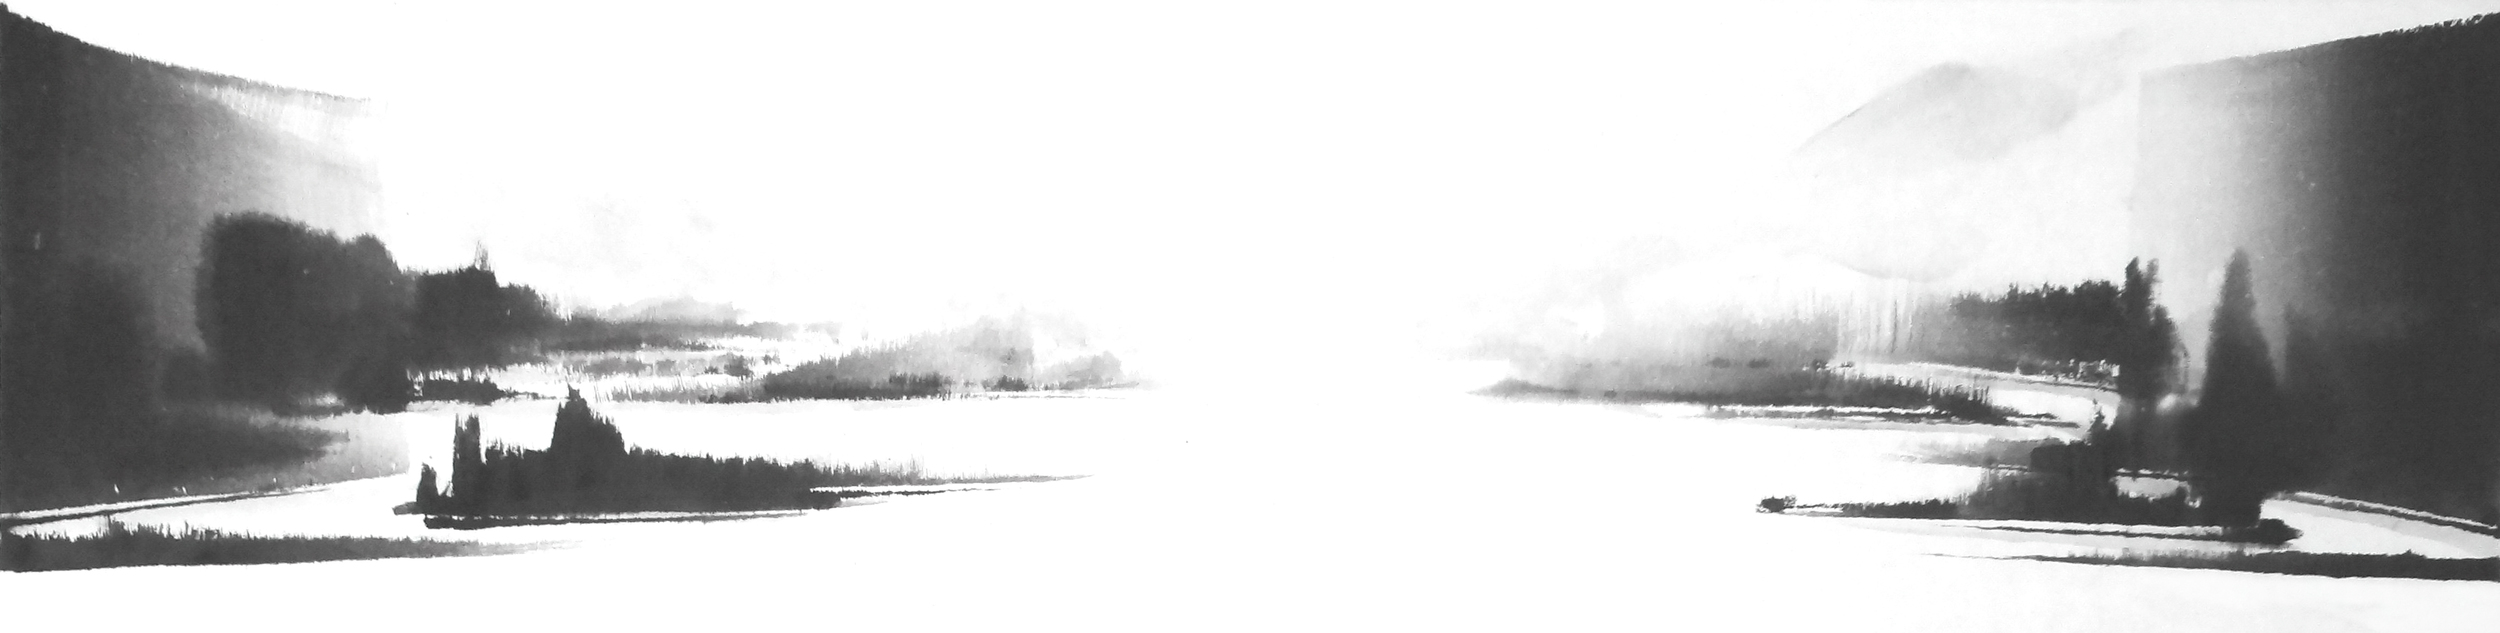 g.그 빛 다시 Again in His Light, 38X140cm, ink on paper, 2012.JPG